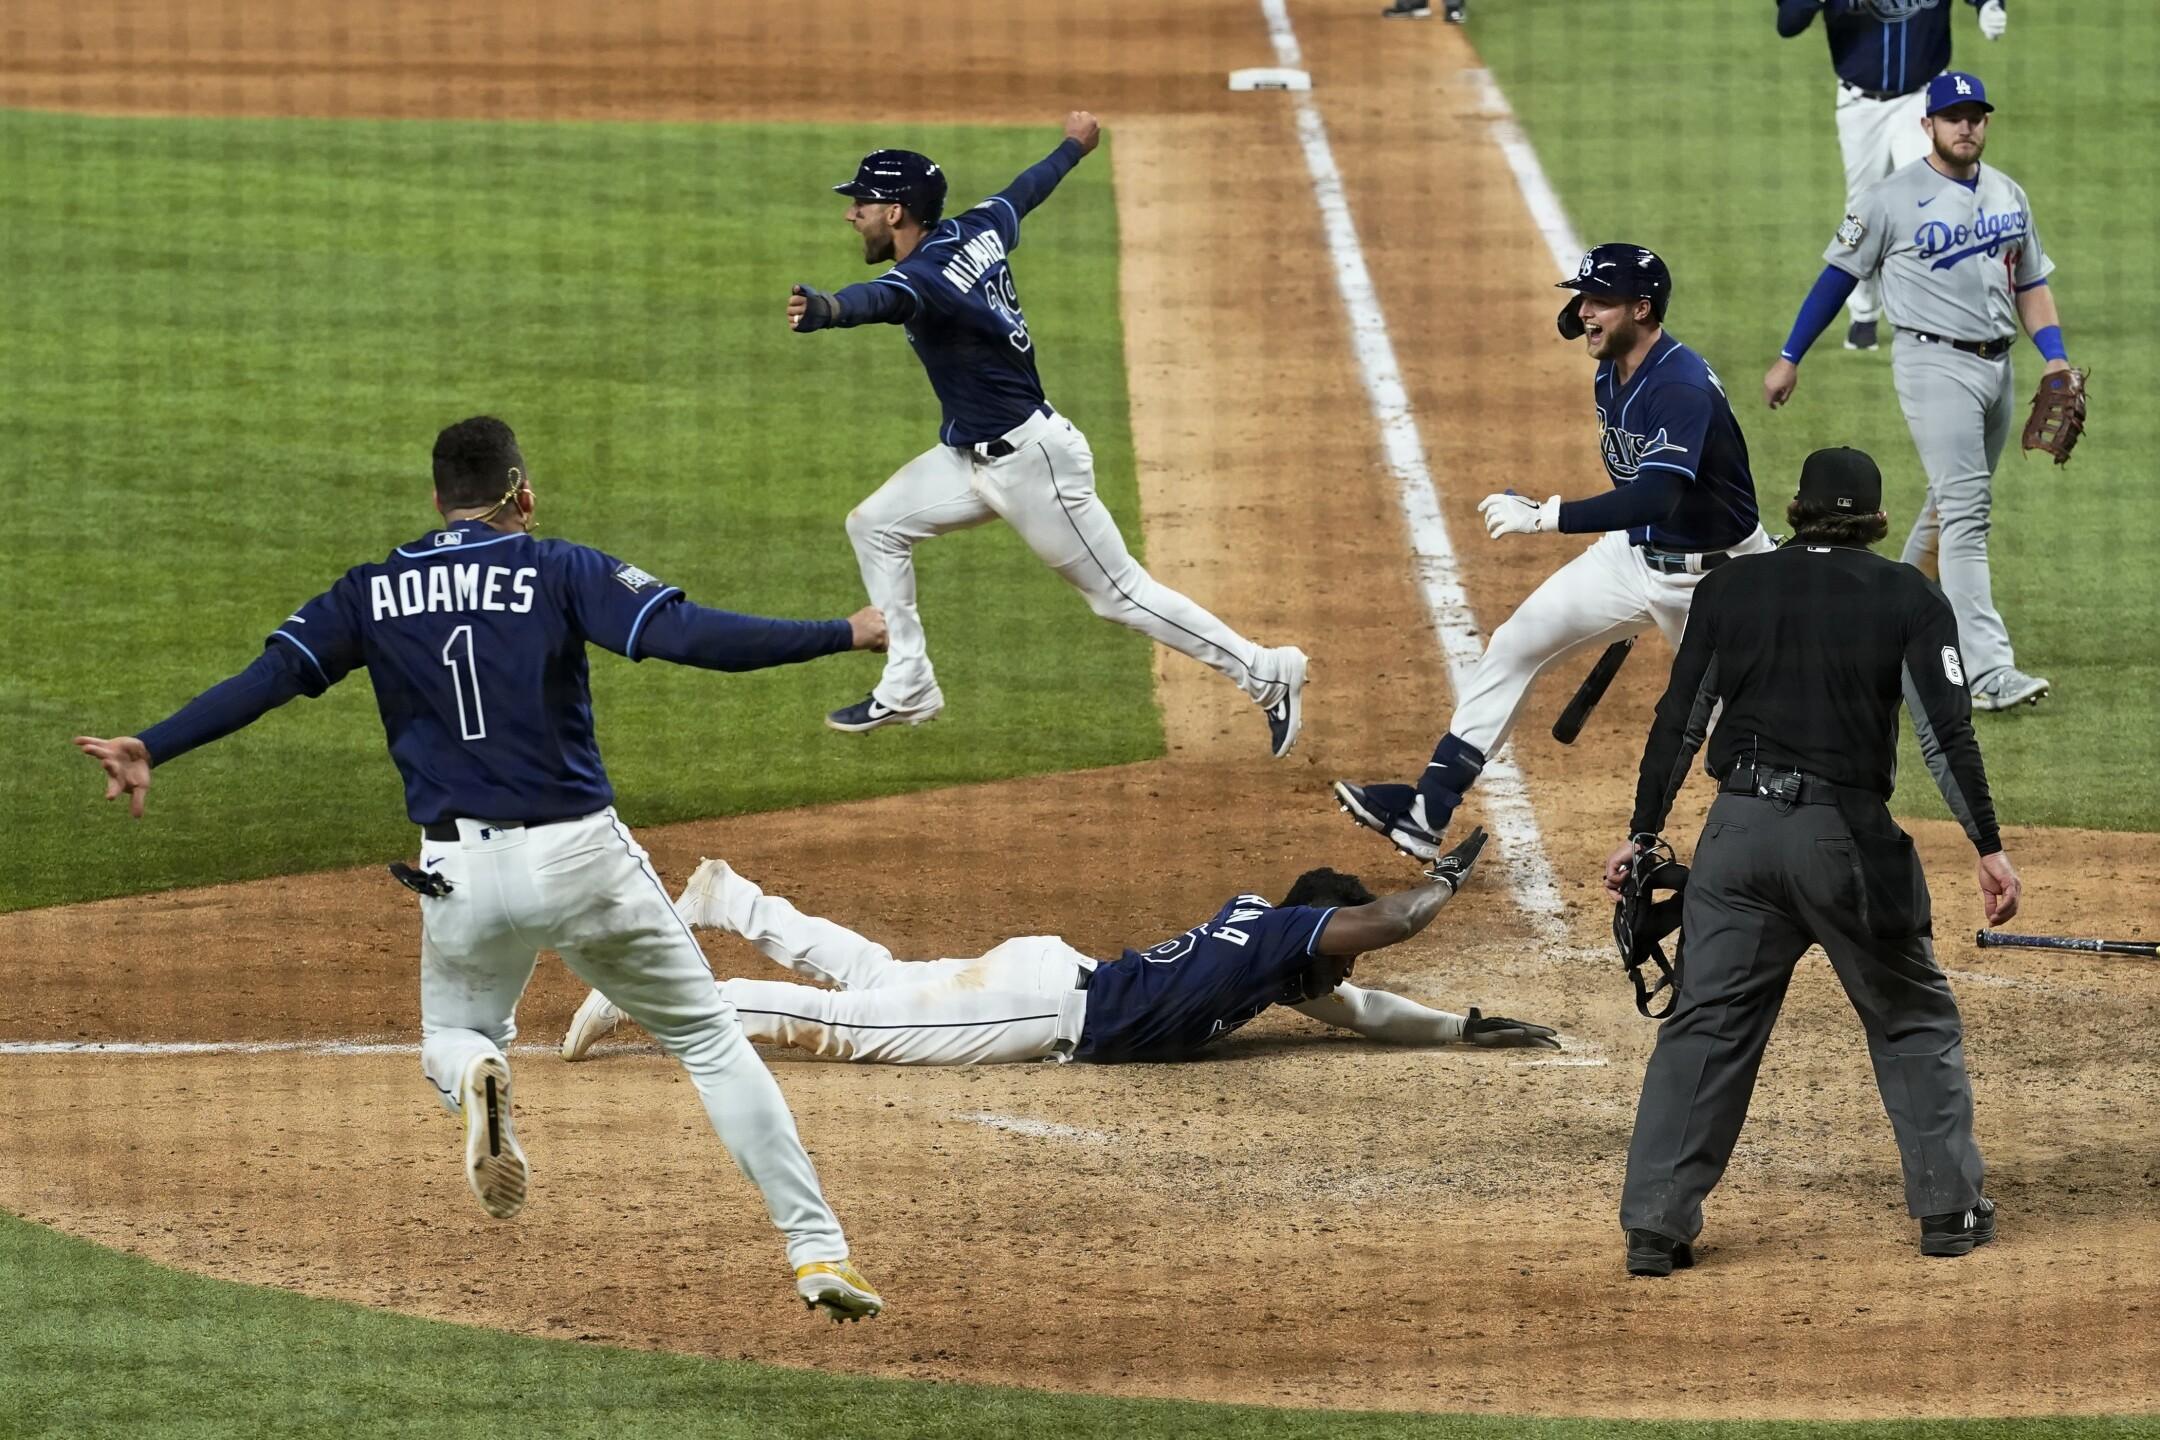 APTOPIX World Series Dodgers Rays Baseball